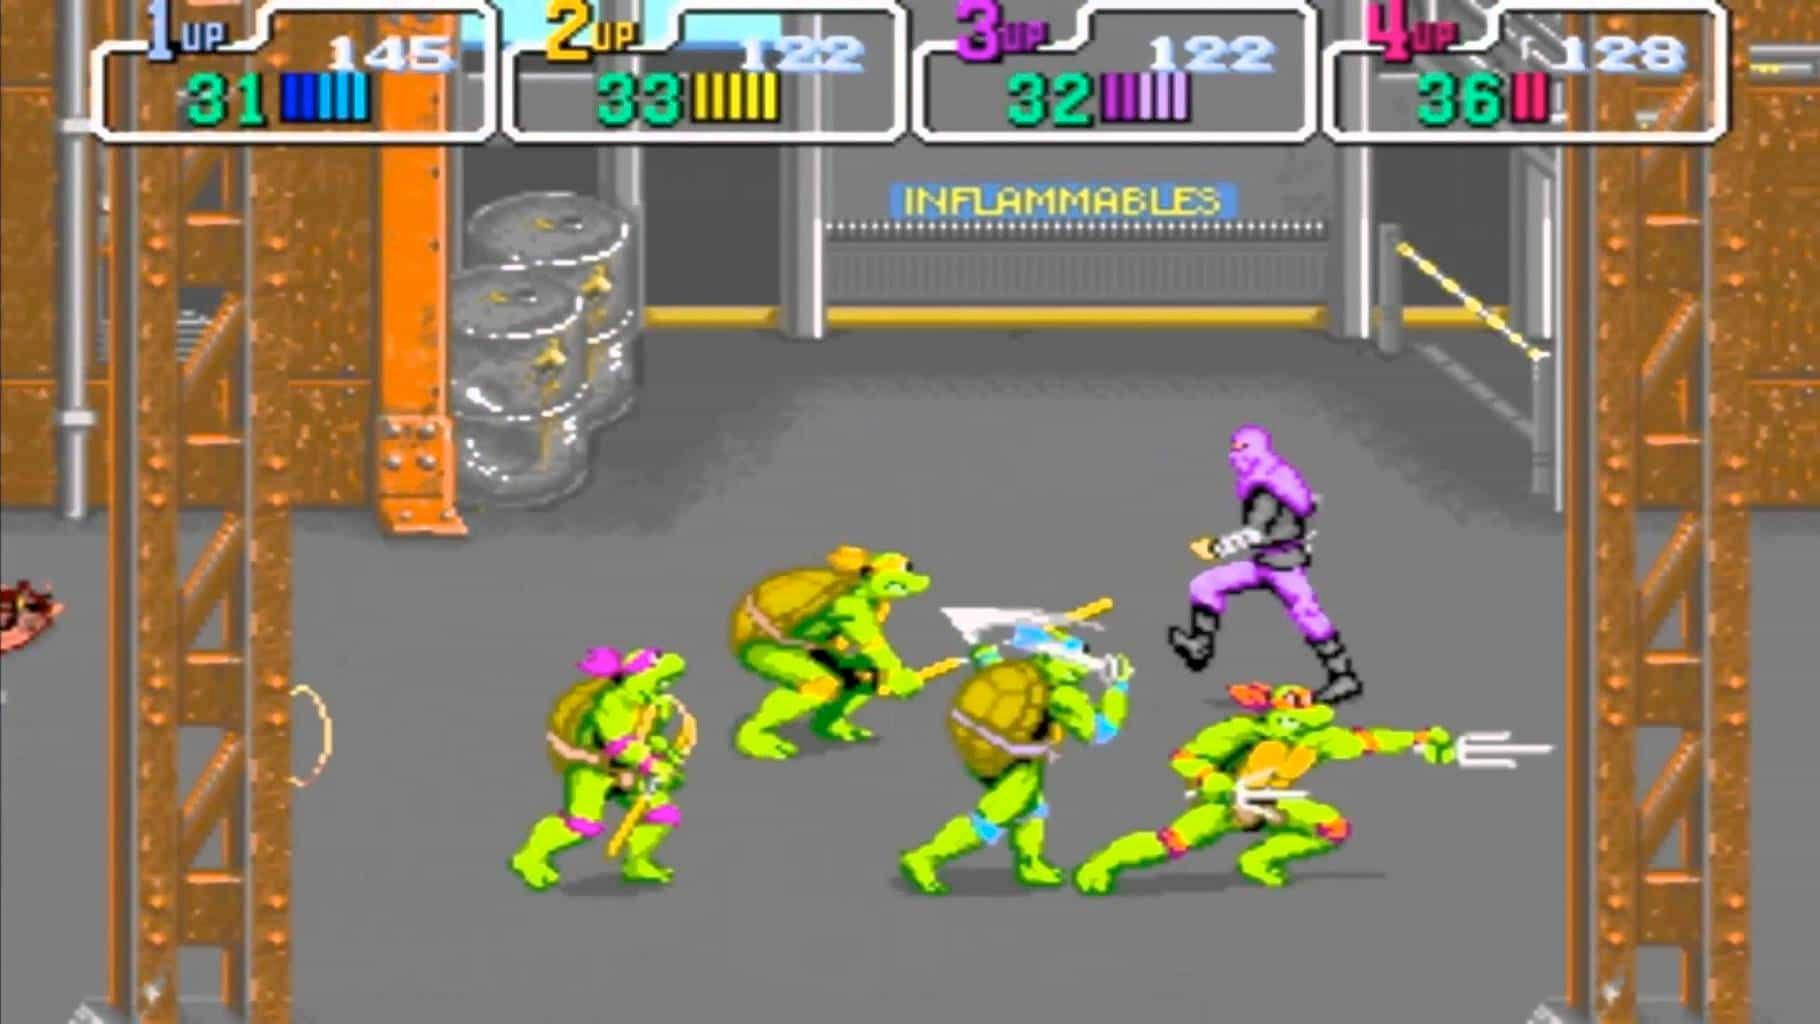 Star Wars Marvel And Teenage Mutant Ninja Turtles Arcade Game Cabinets Coming Soon Film